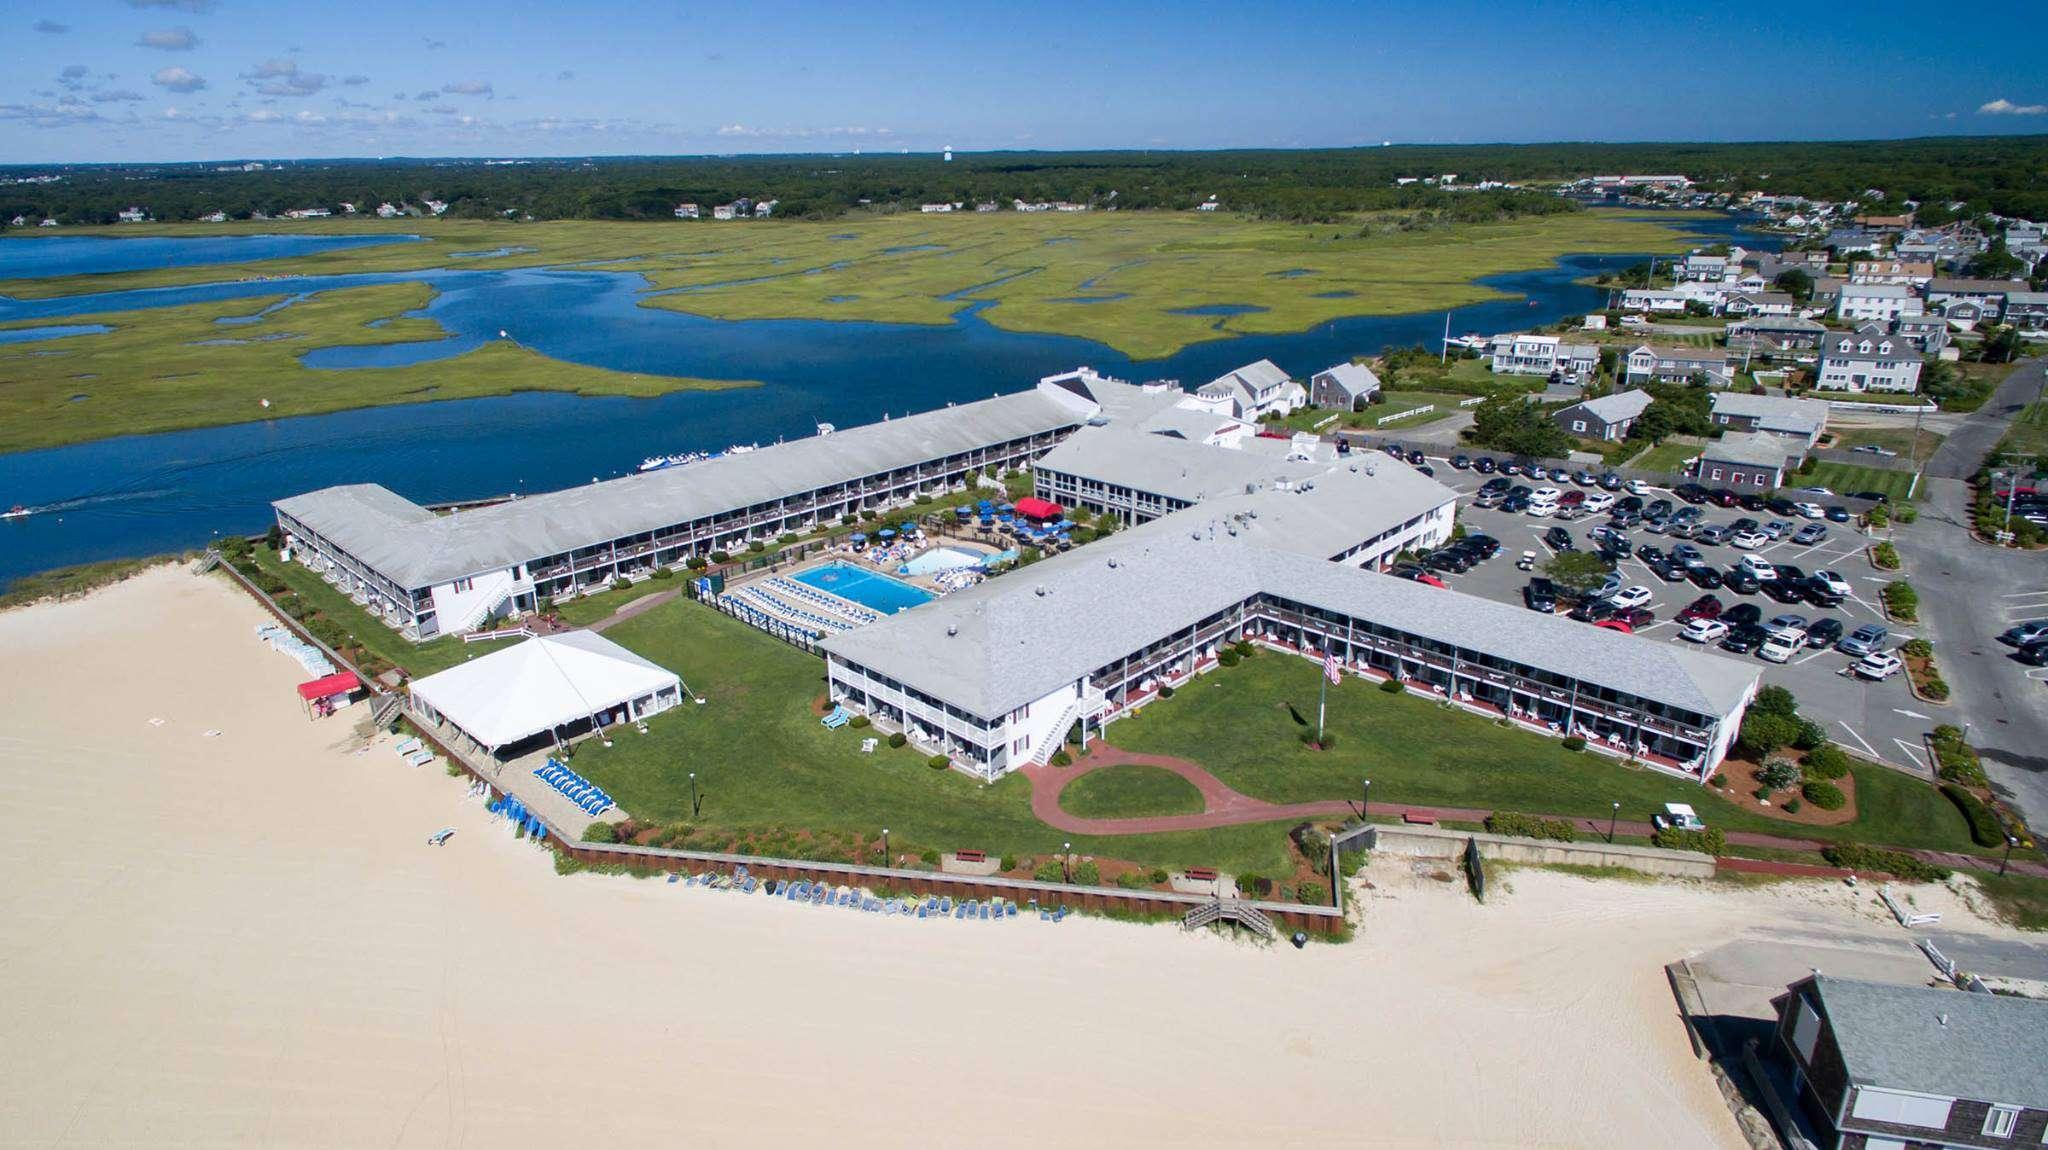 id rental home to in dennis ma cottage beach rentals cod bayview vacation walk block cape min mayflower